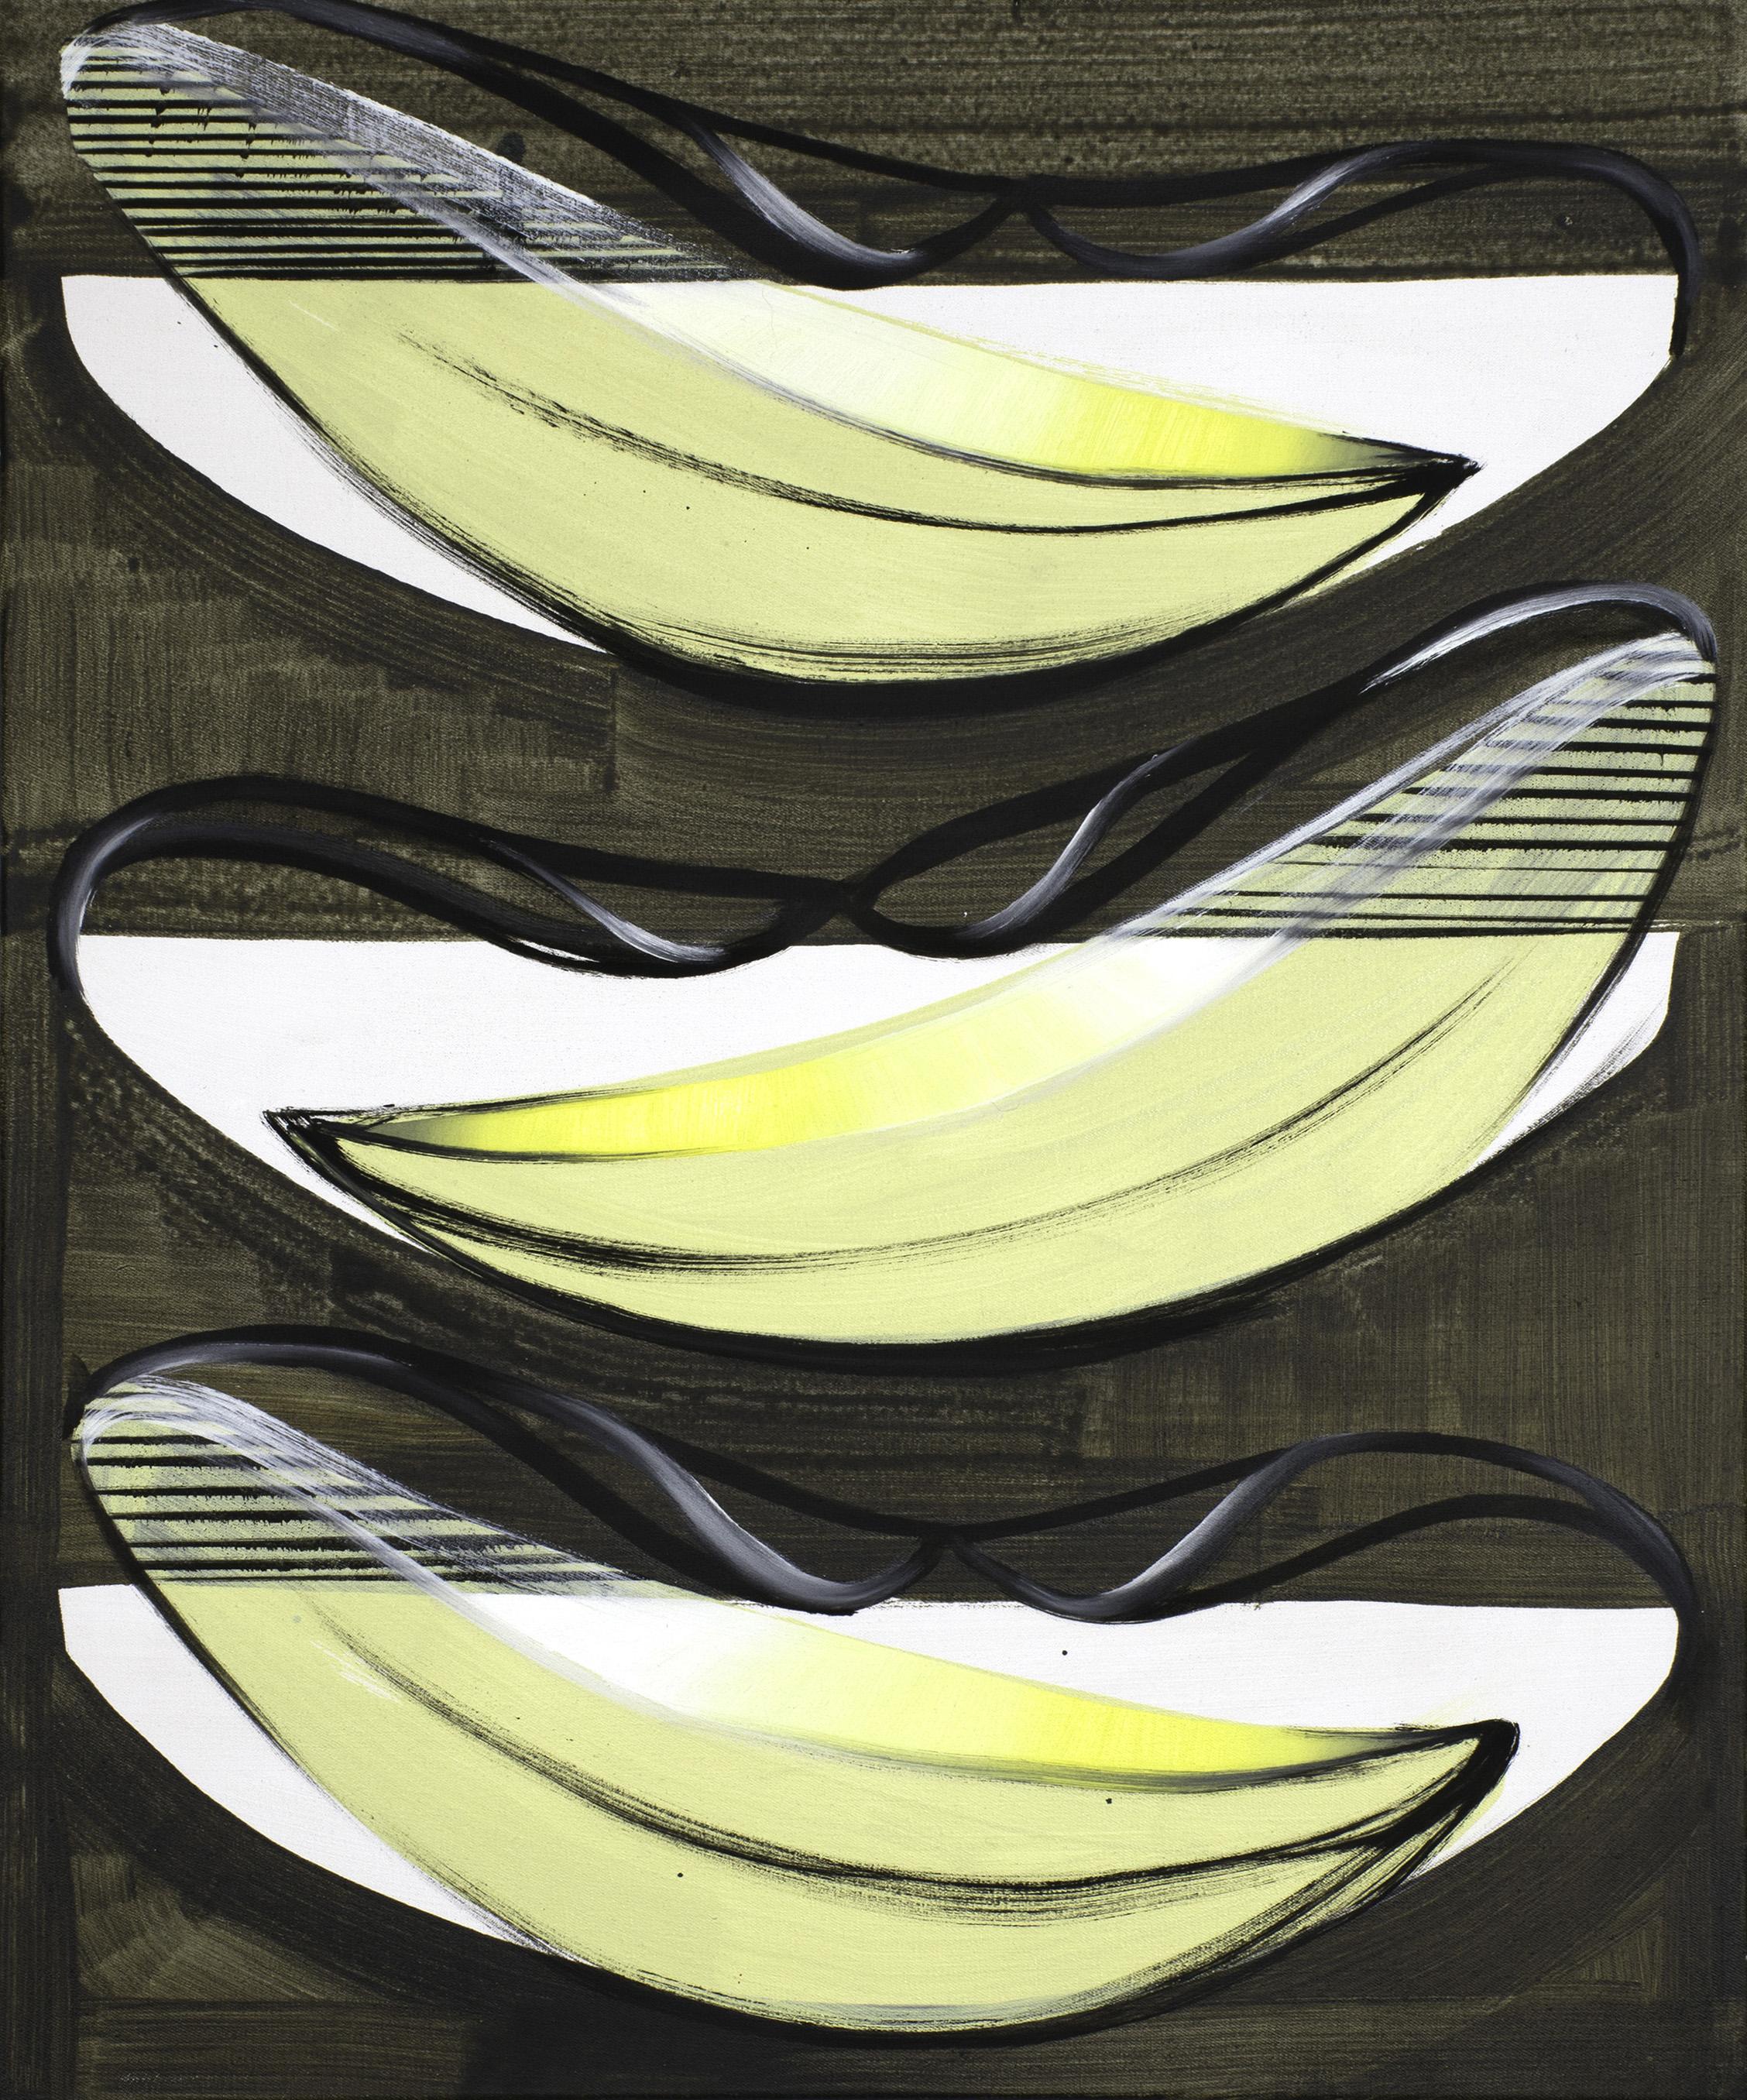 Janine van Oene / Banana Nah